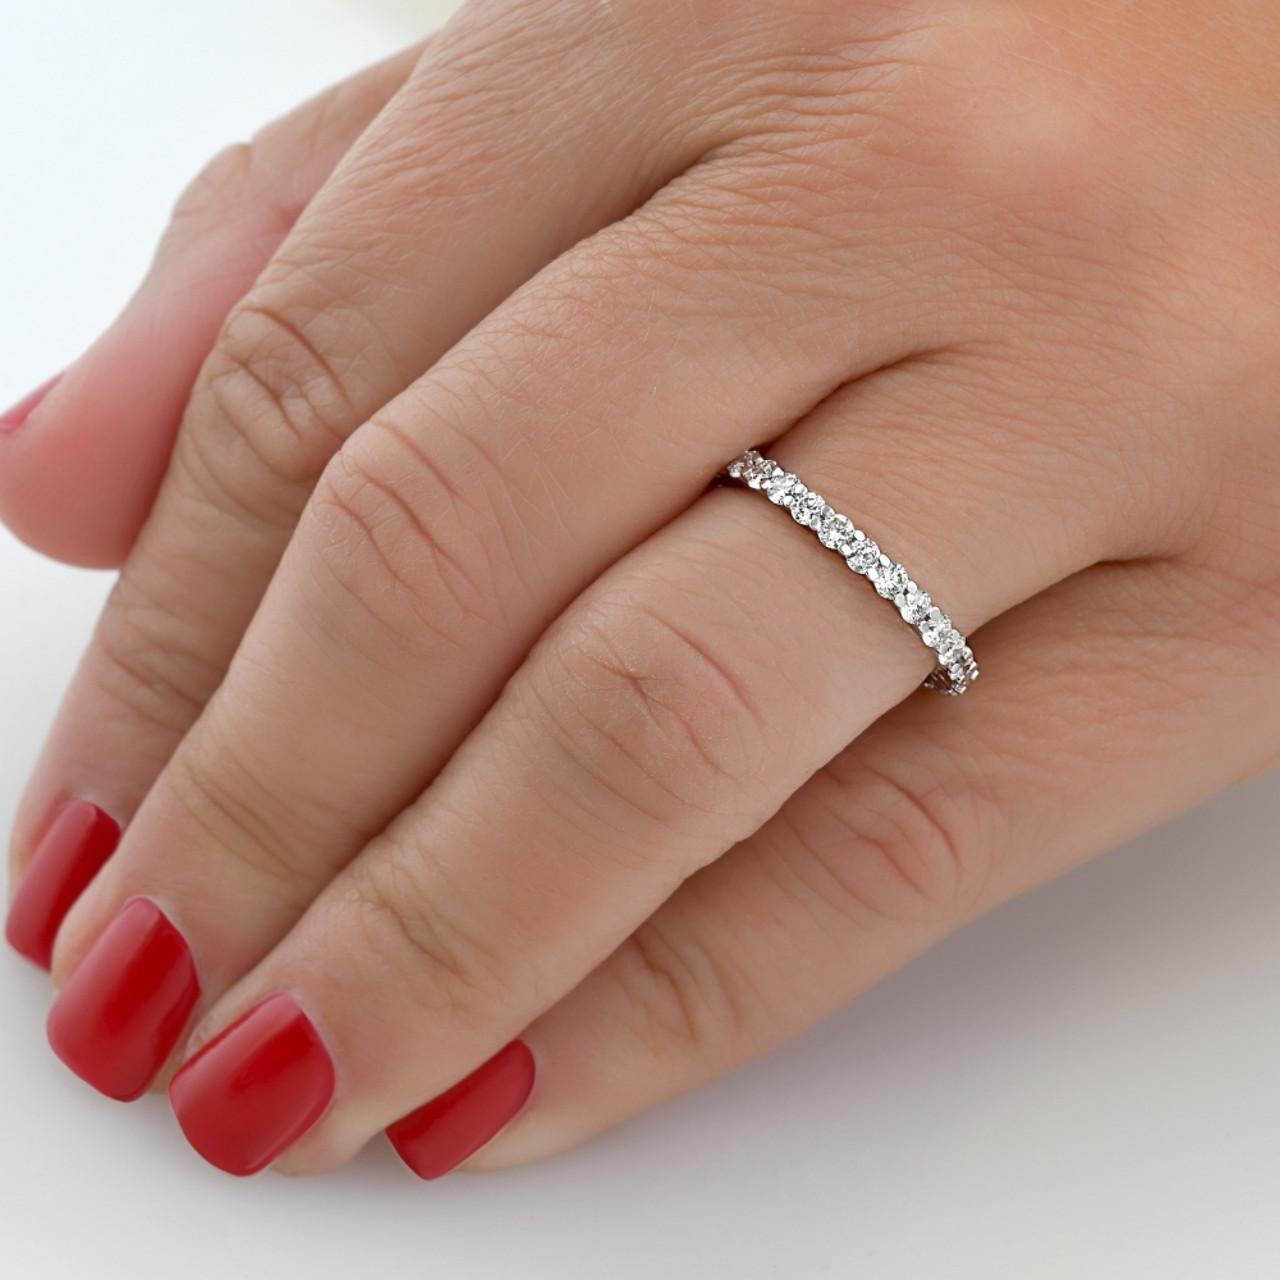 1ct Diamond Eternity Wedding Ring in 14k White Yellow Rose Gold